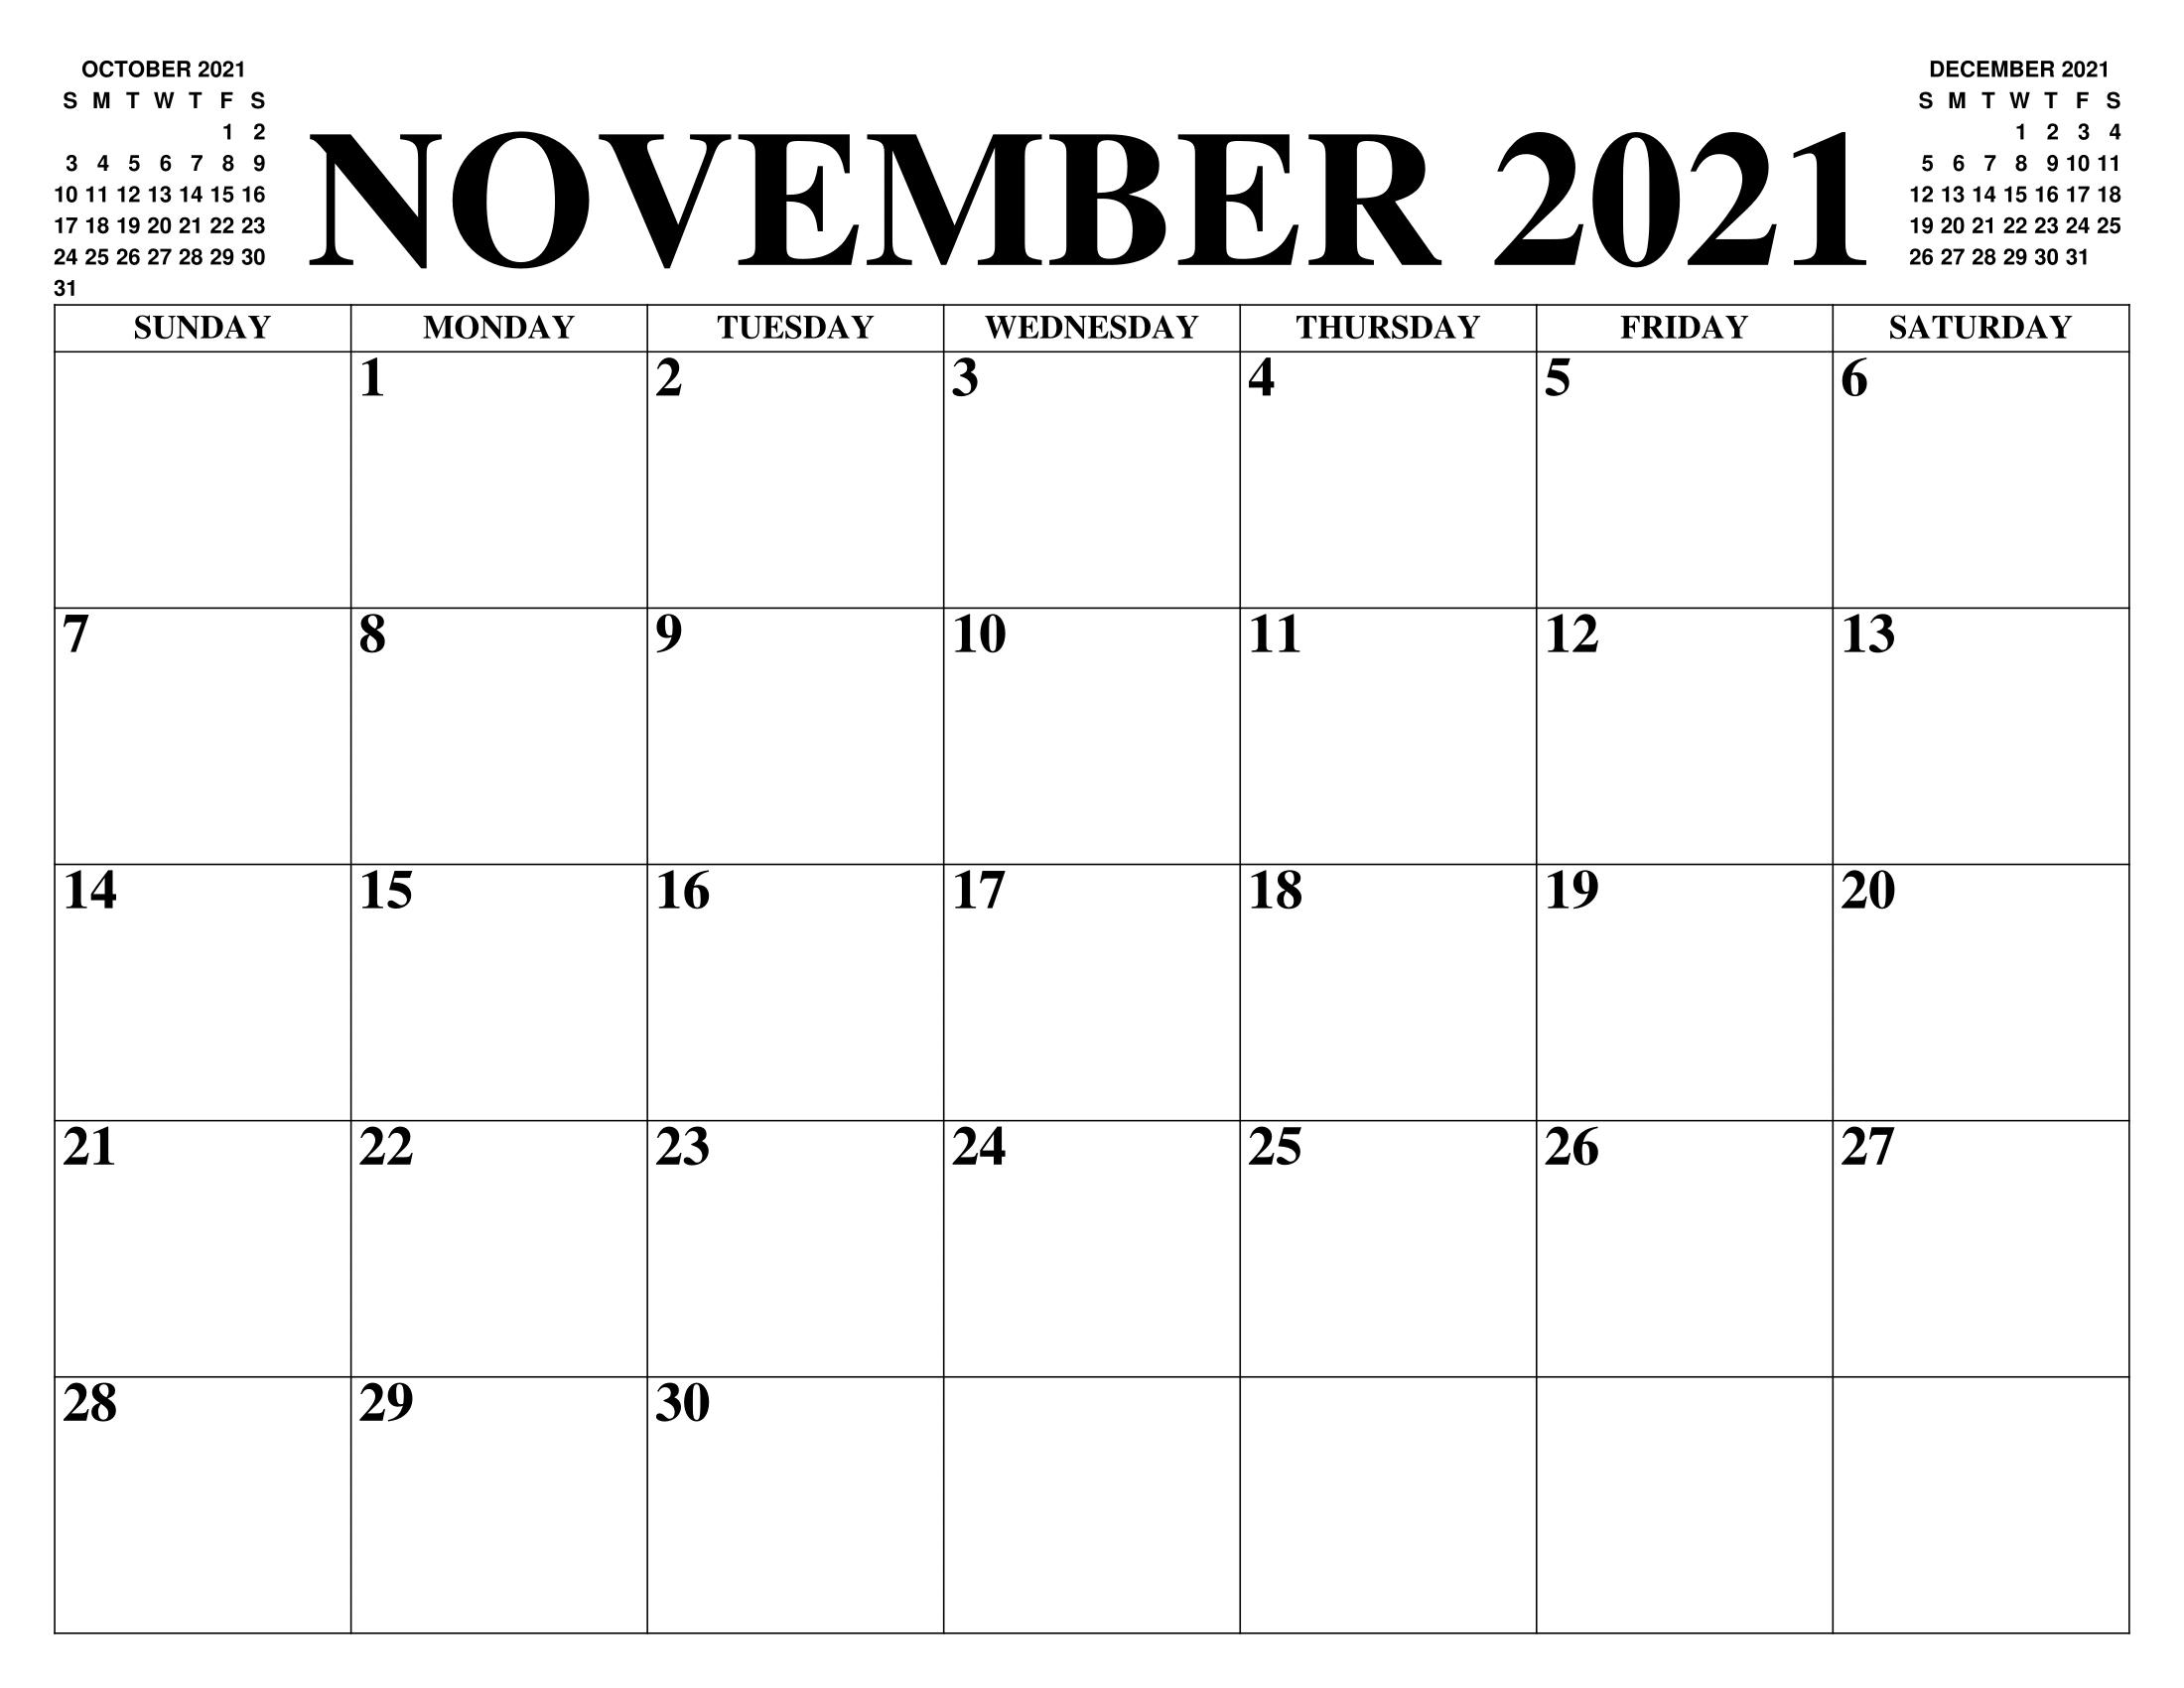 November 2021 Calendar With Summer Holidays